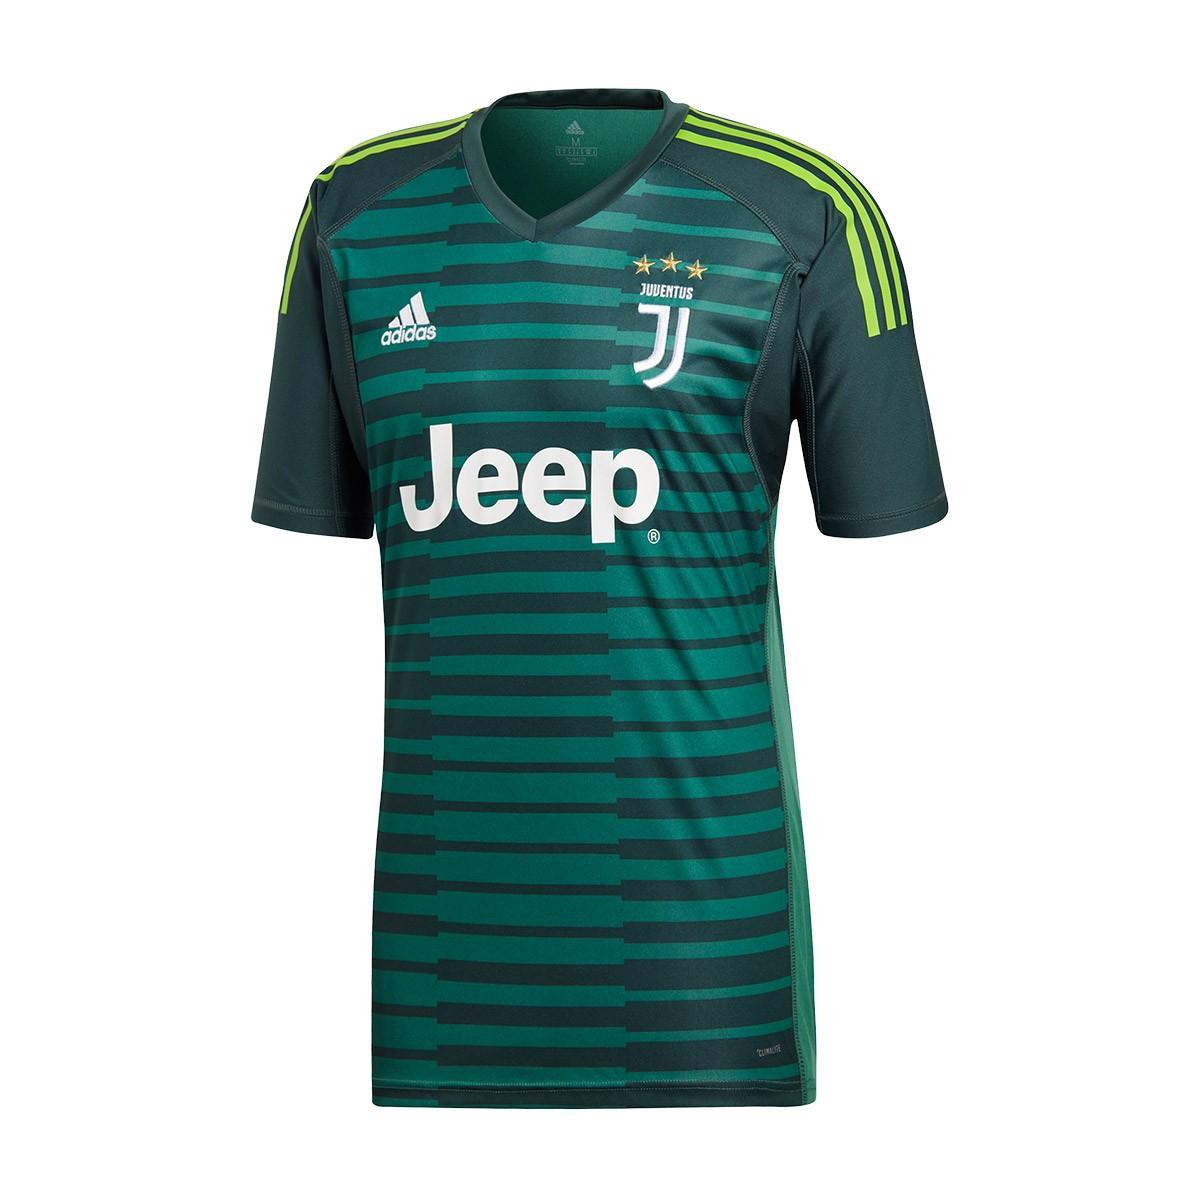 Camiseta adidas Juventus Portero 2018-2019 Mineral green-Tech forest ... 9bee8ec67fa